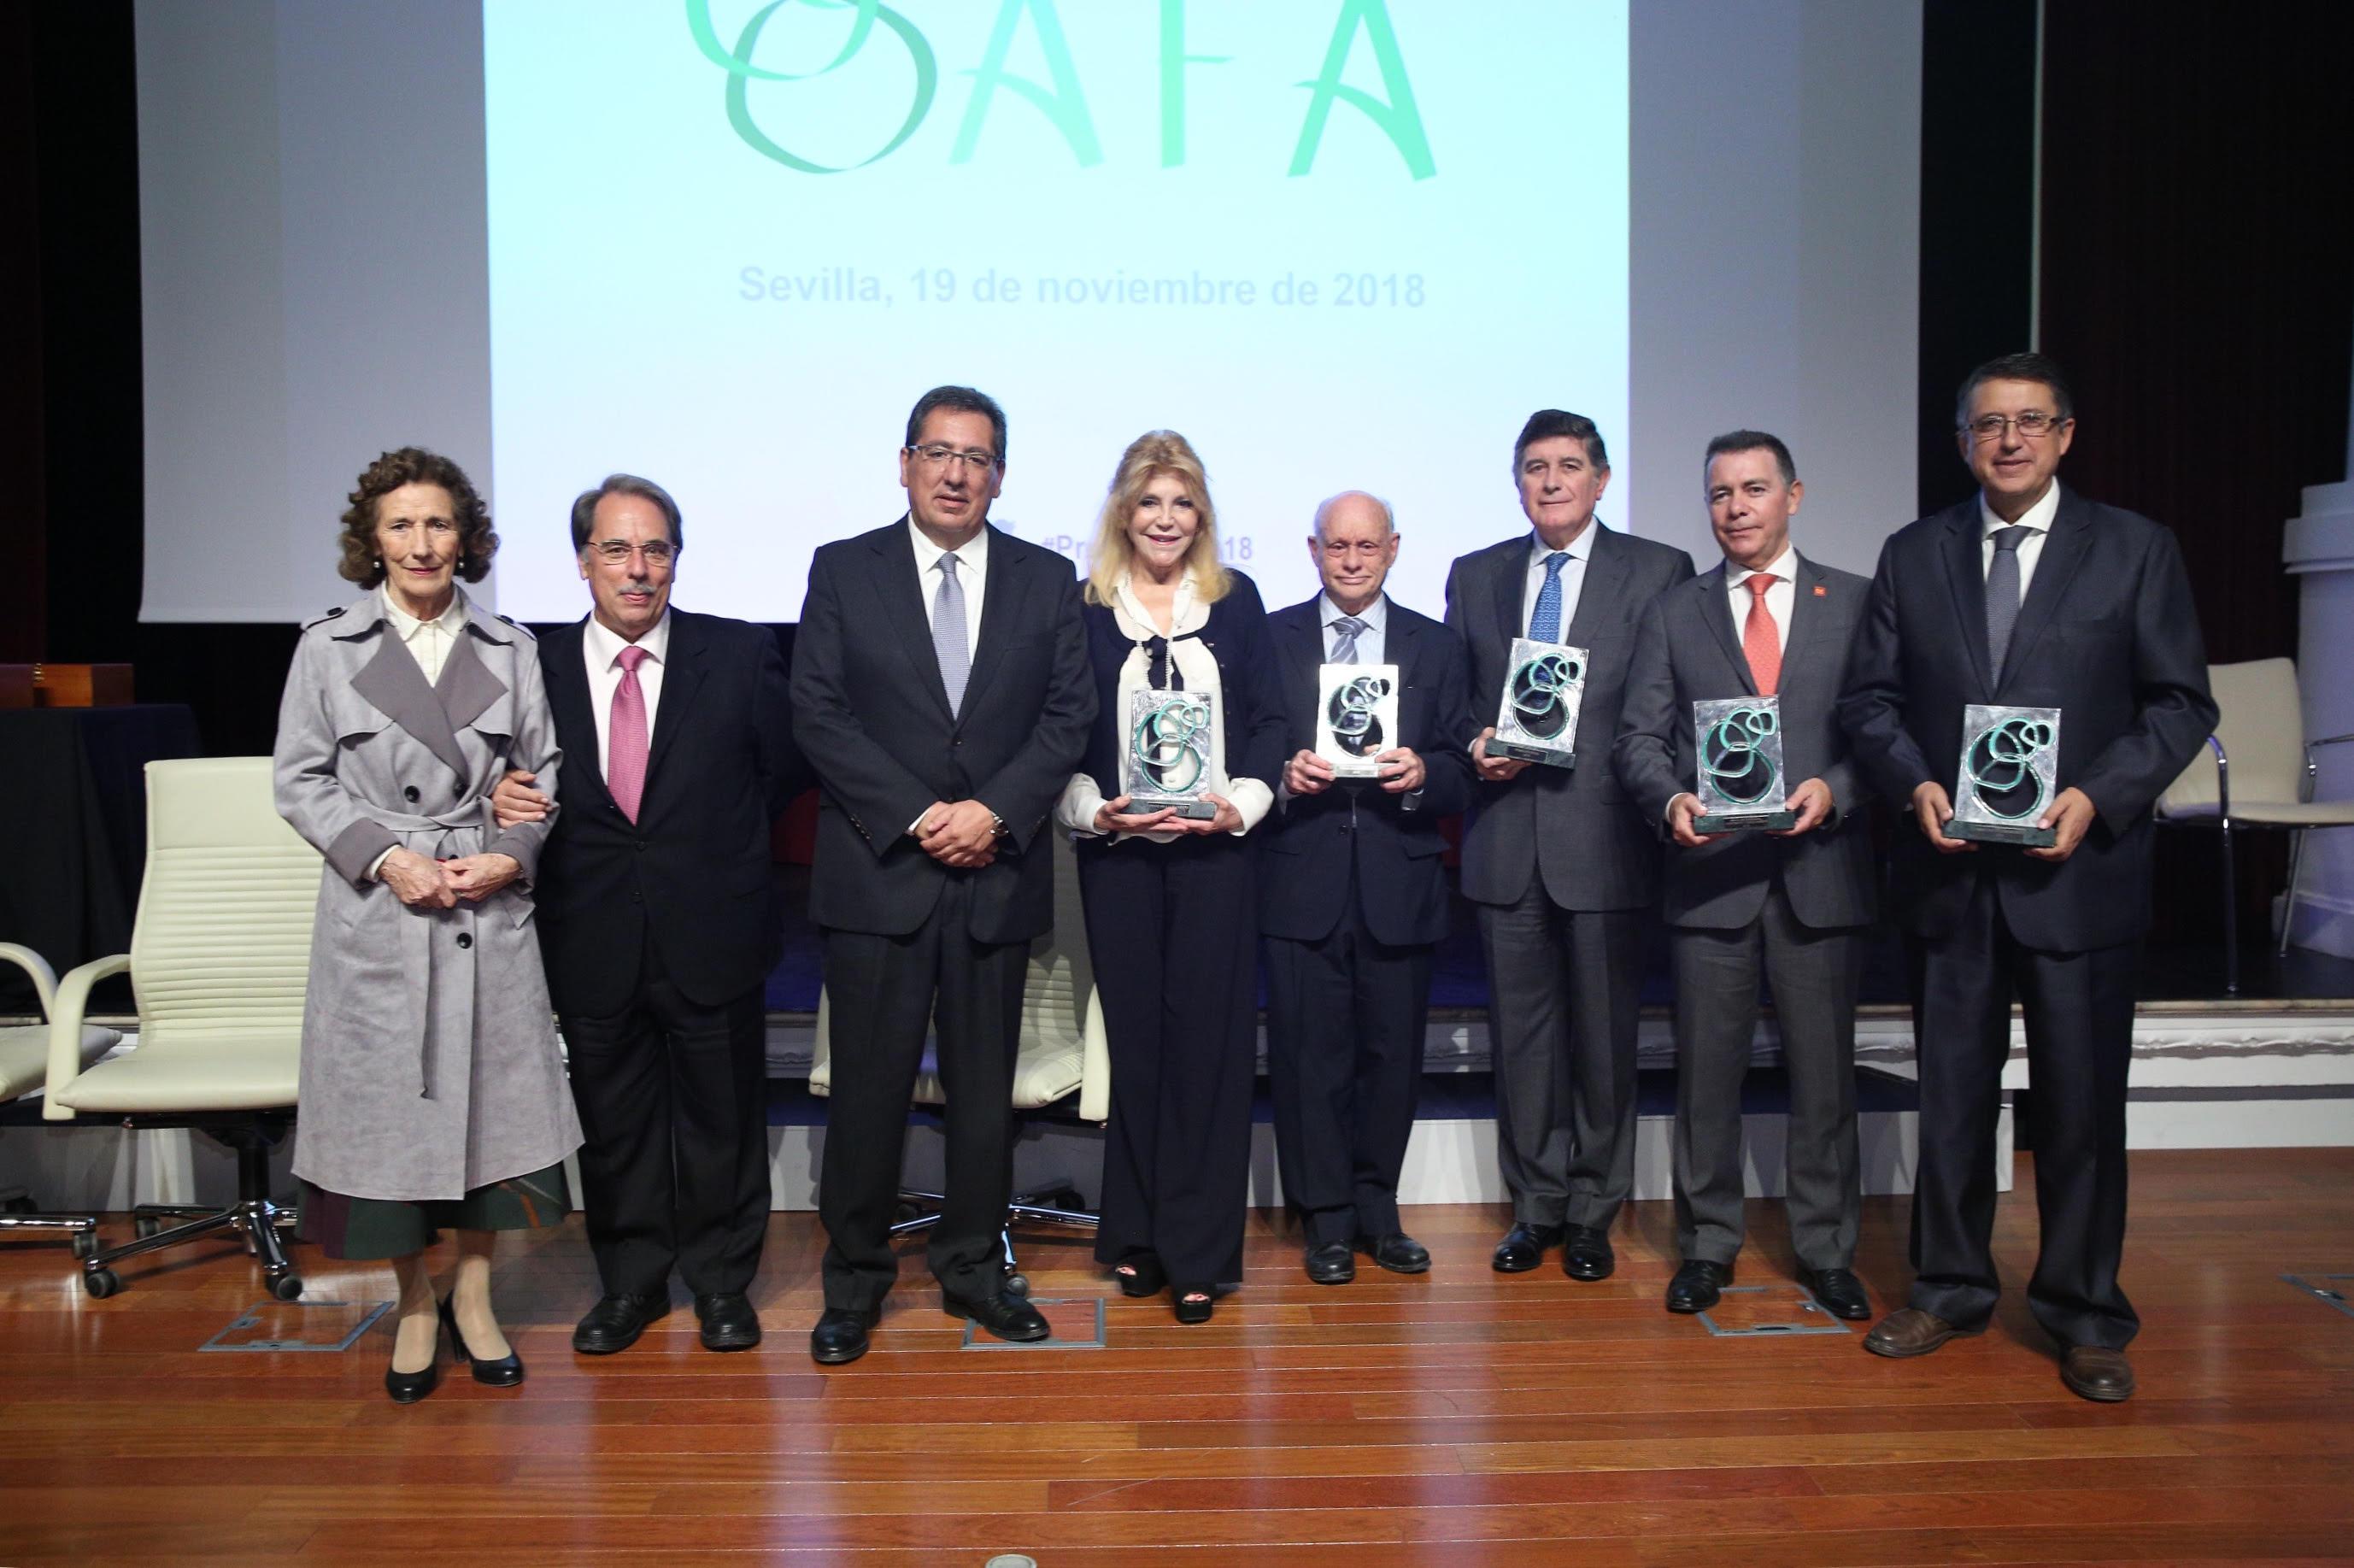 Foto-familia-Premios AFA 2018